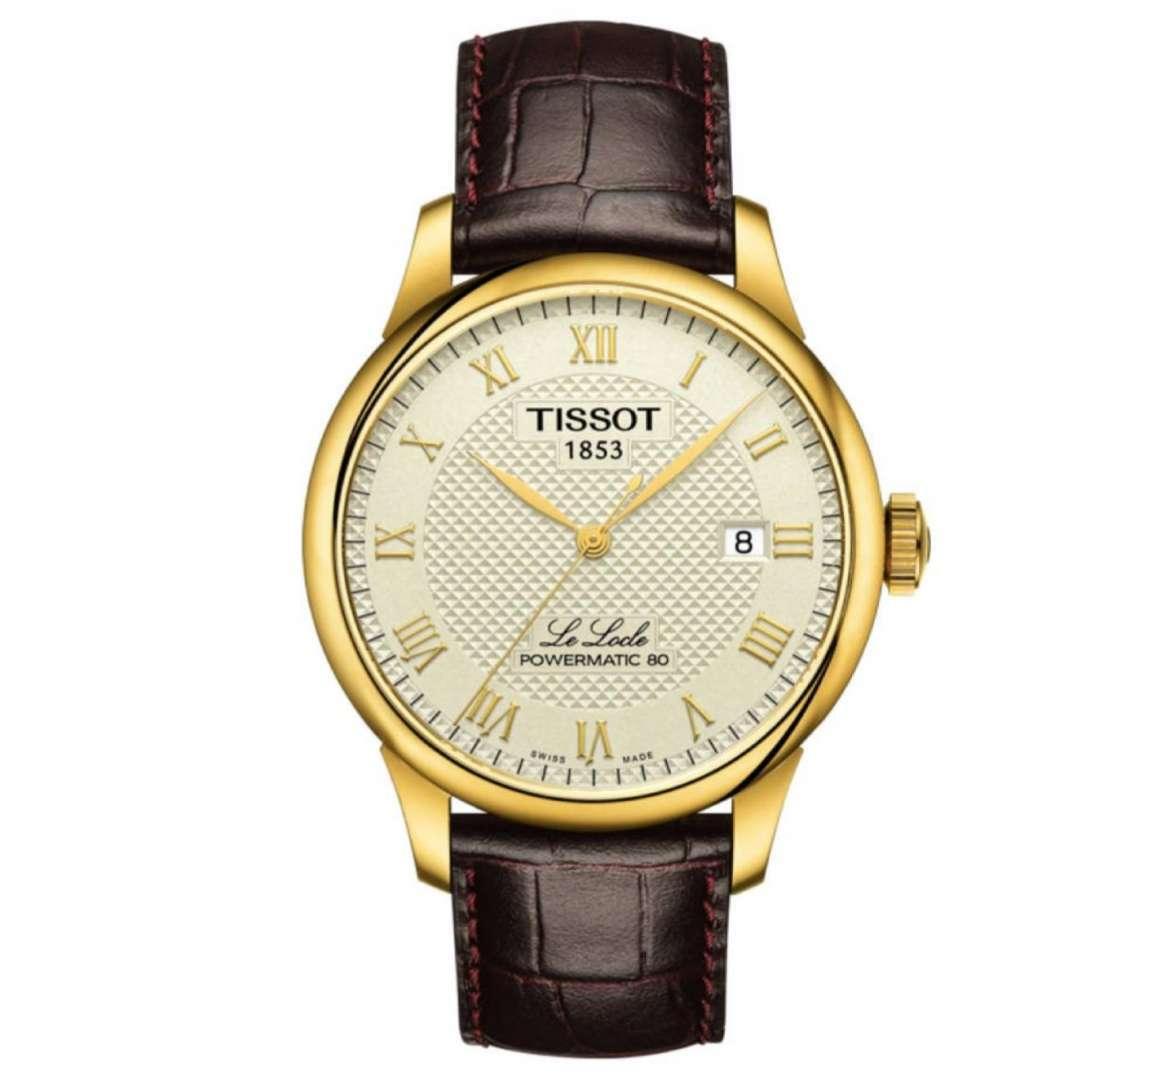 שעון יד אנלוגי tissot t006.407.36.263.00 טיסו